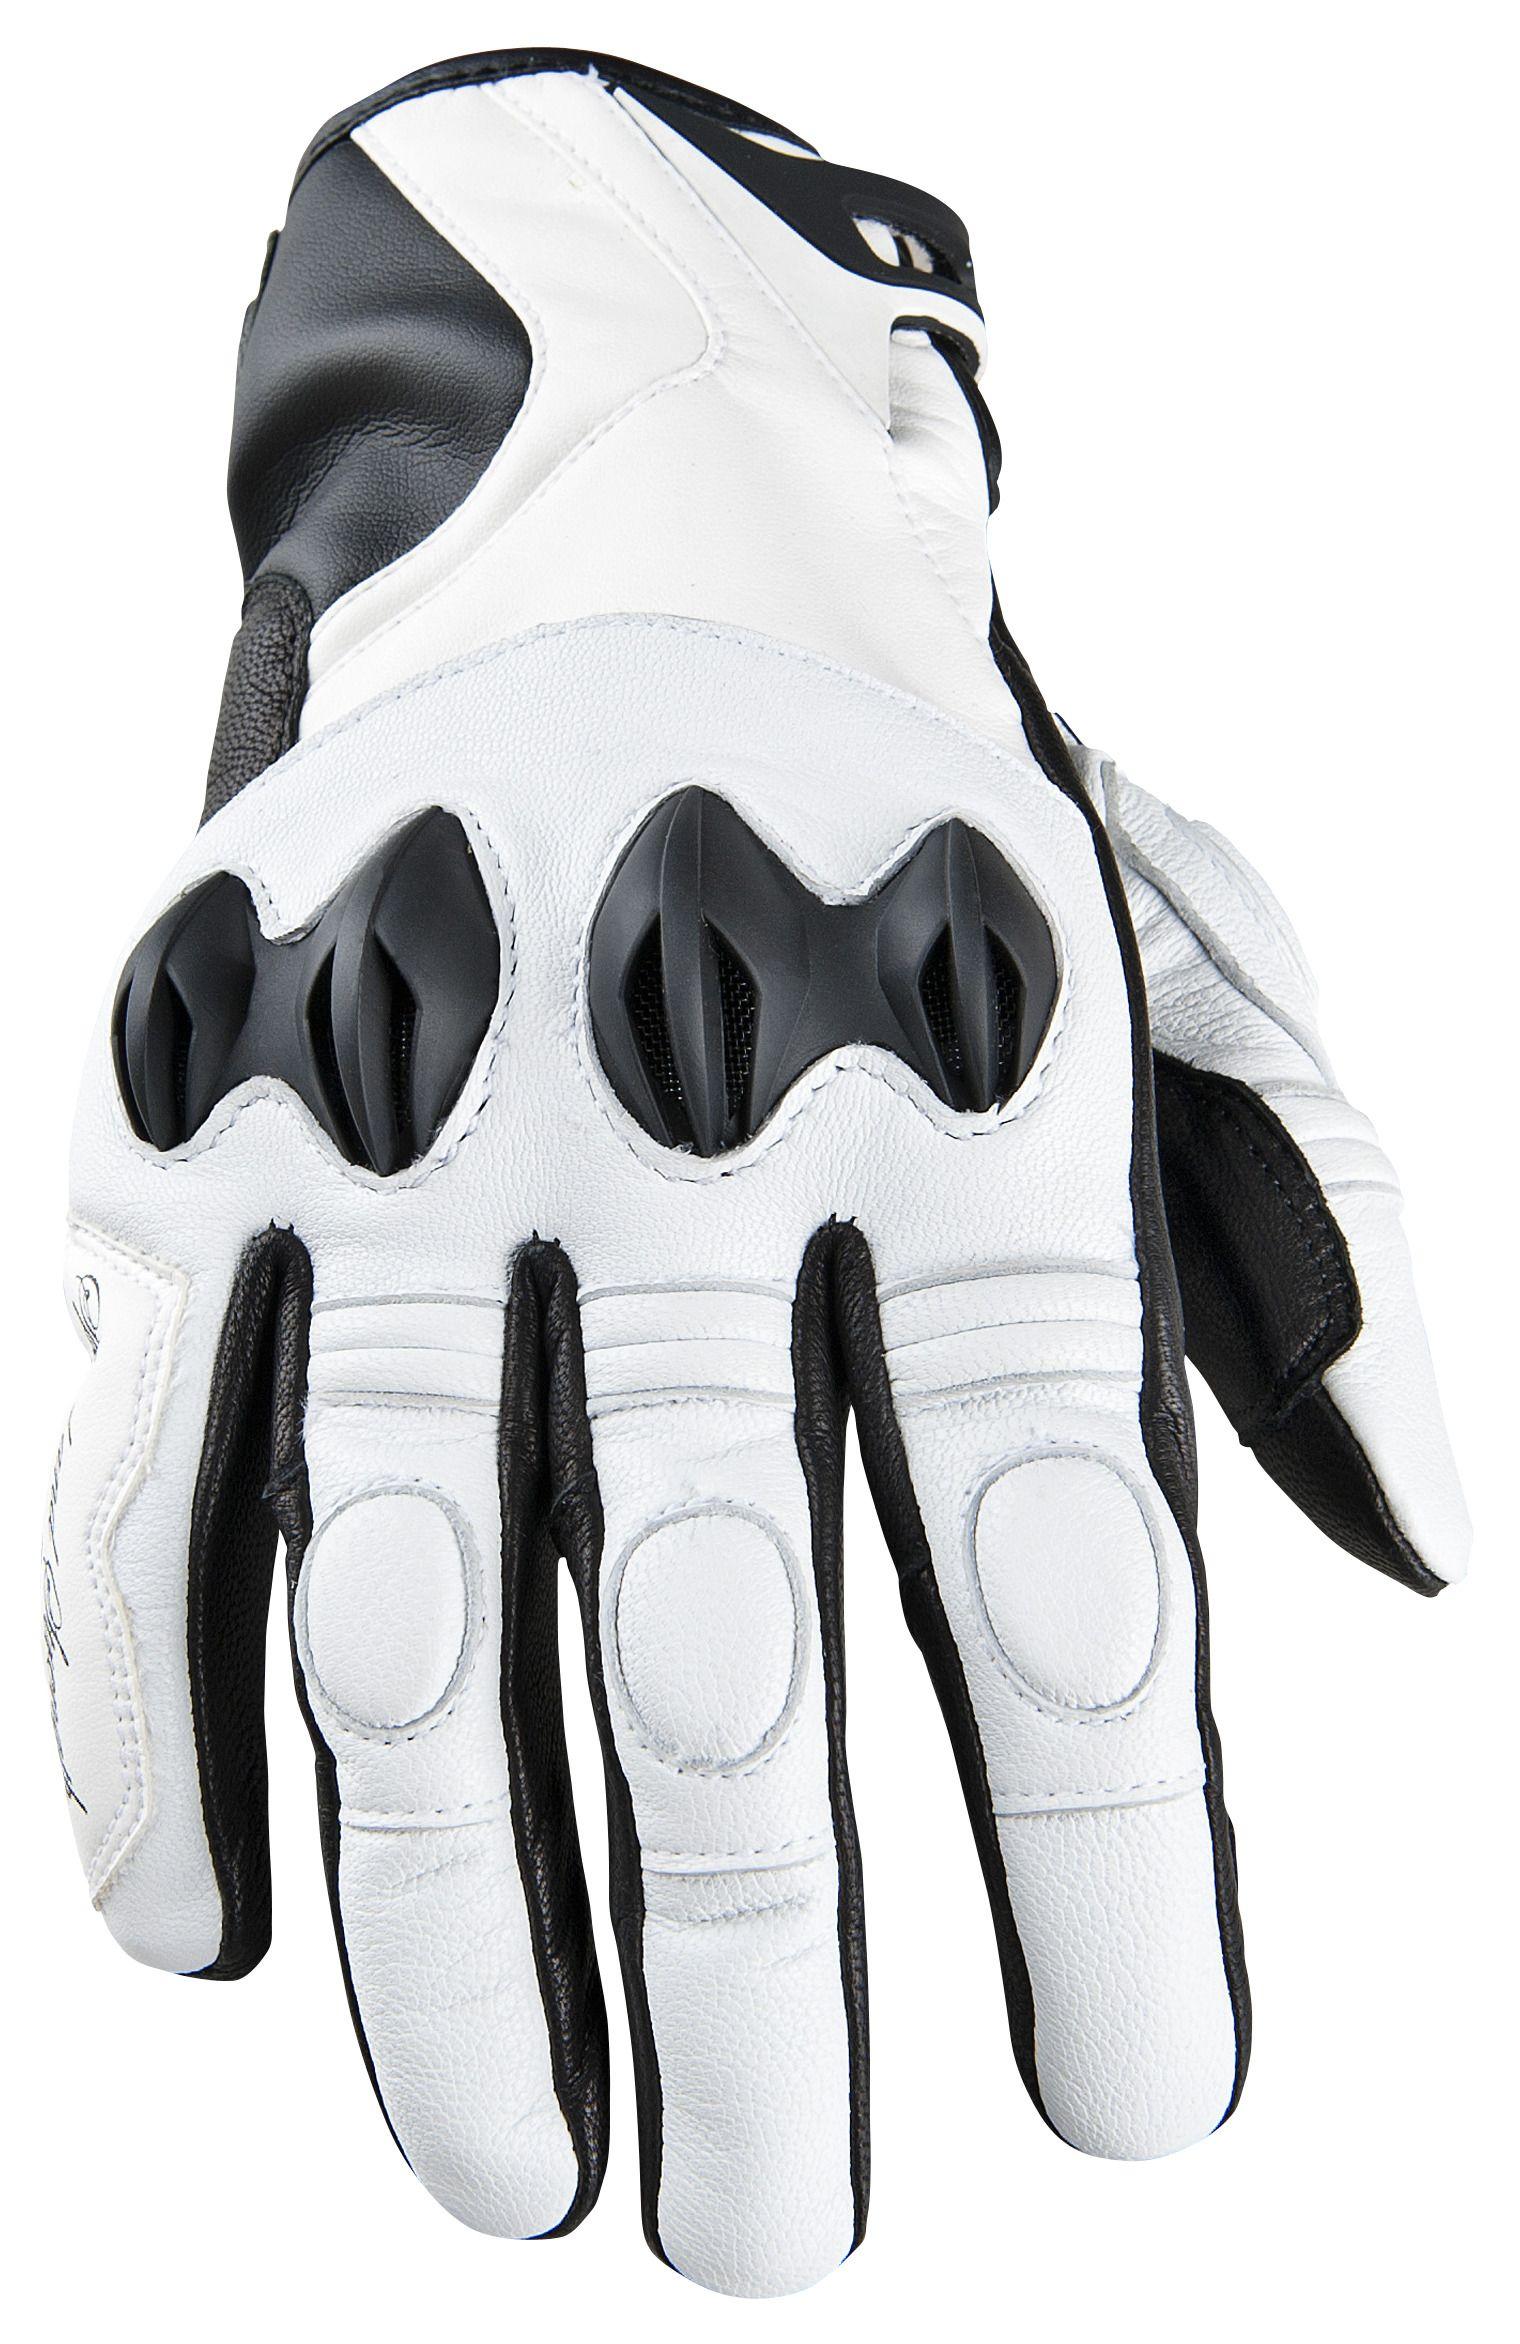 Motorcycle leather gloves amazon - Motorcycle Leather Gloves Amazon 52